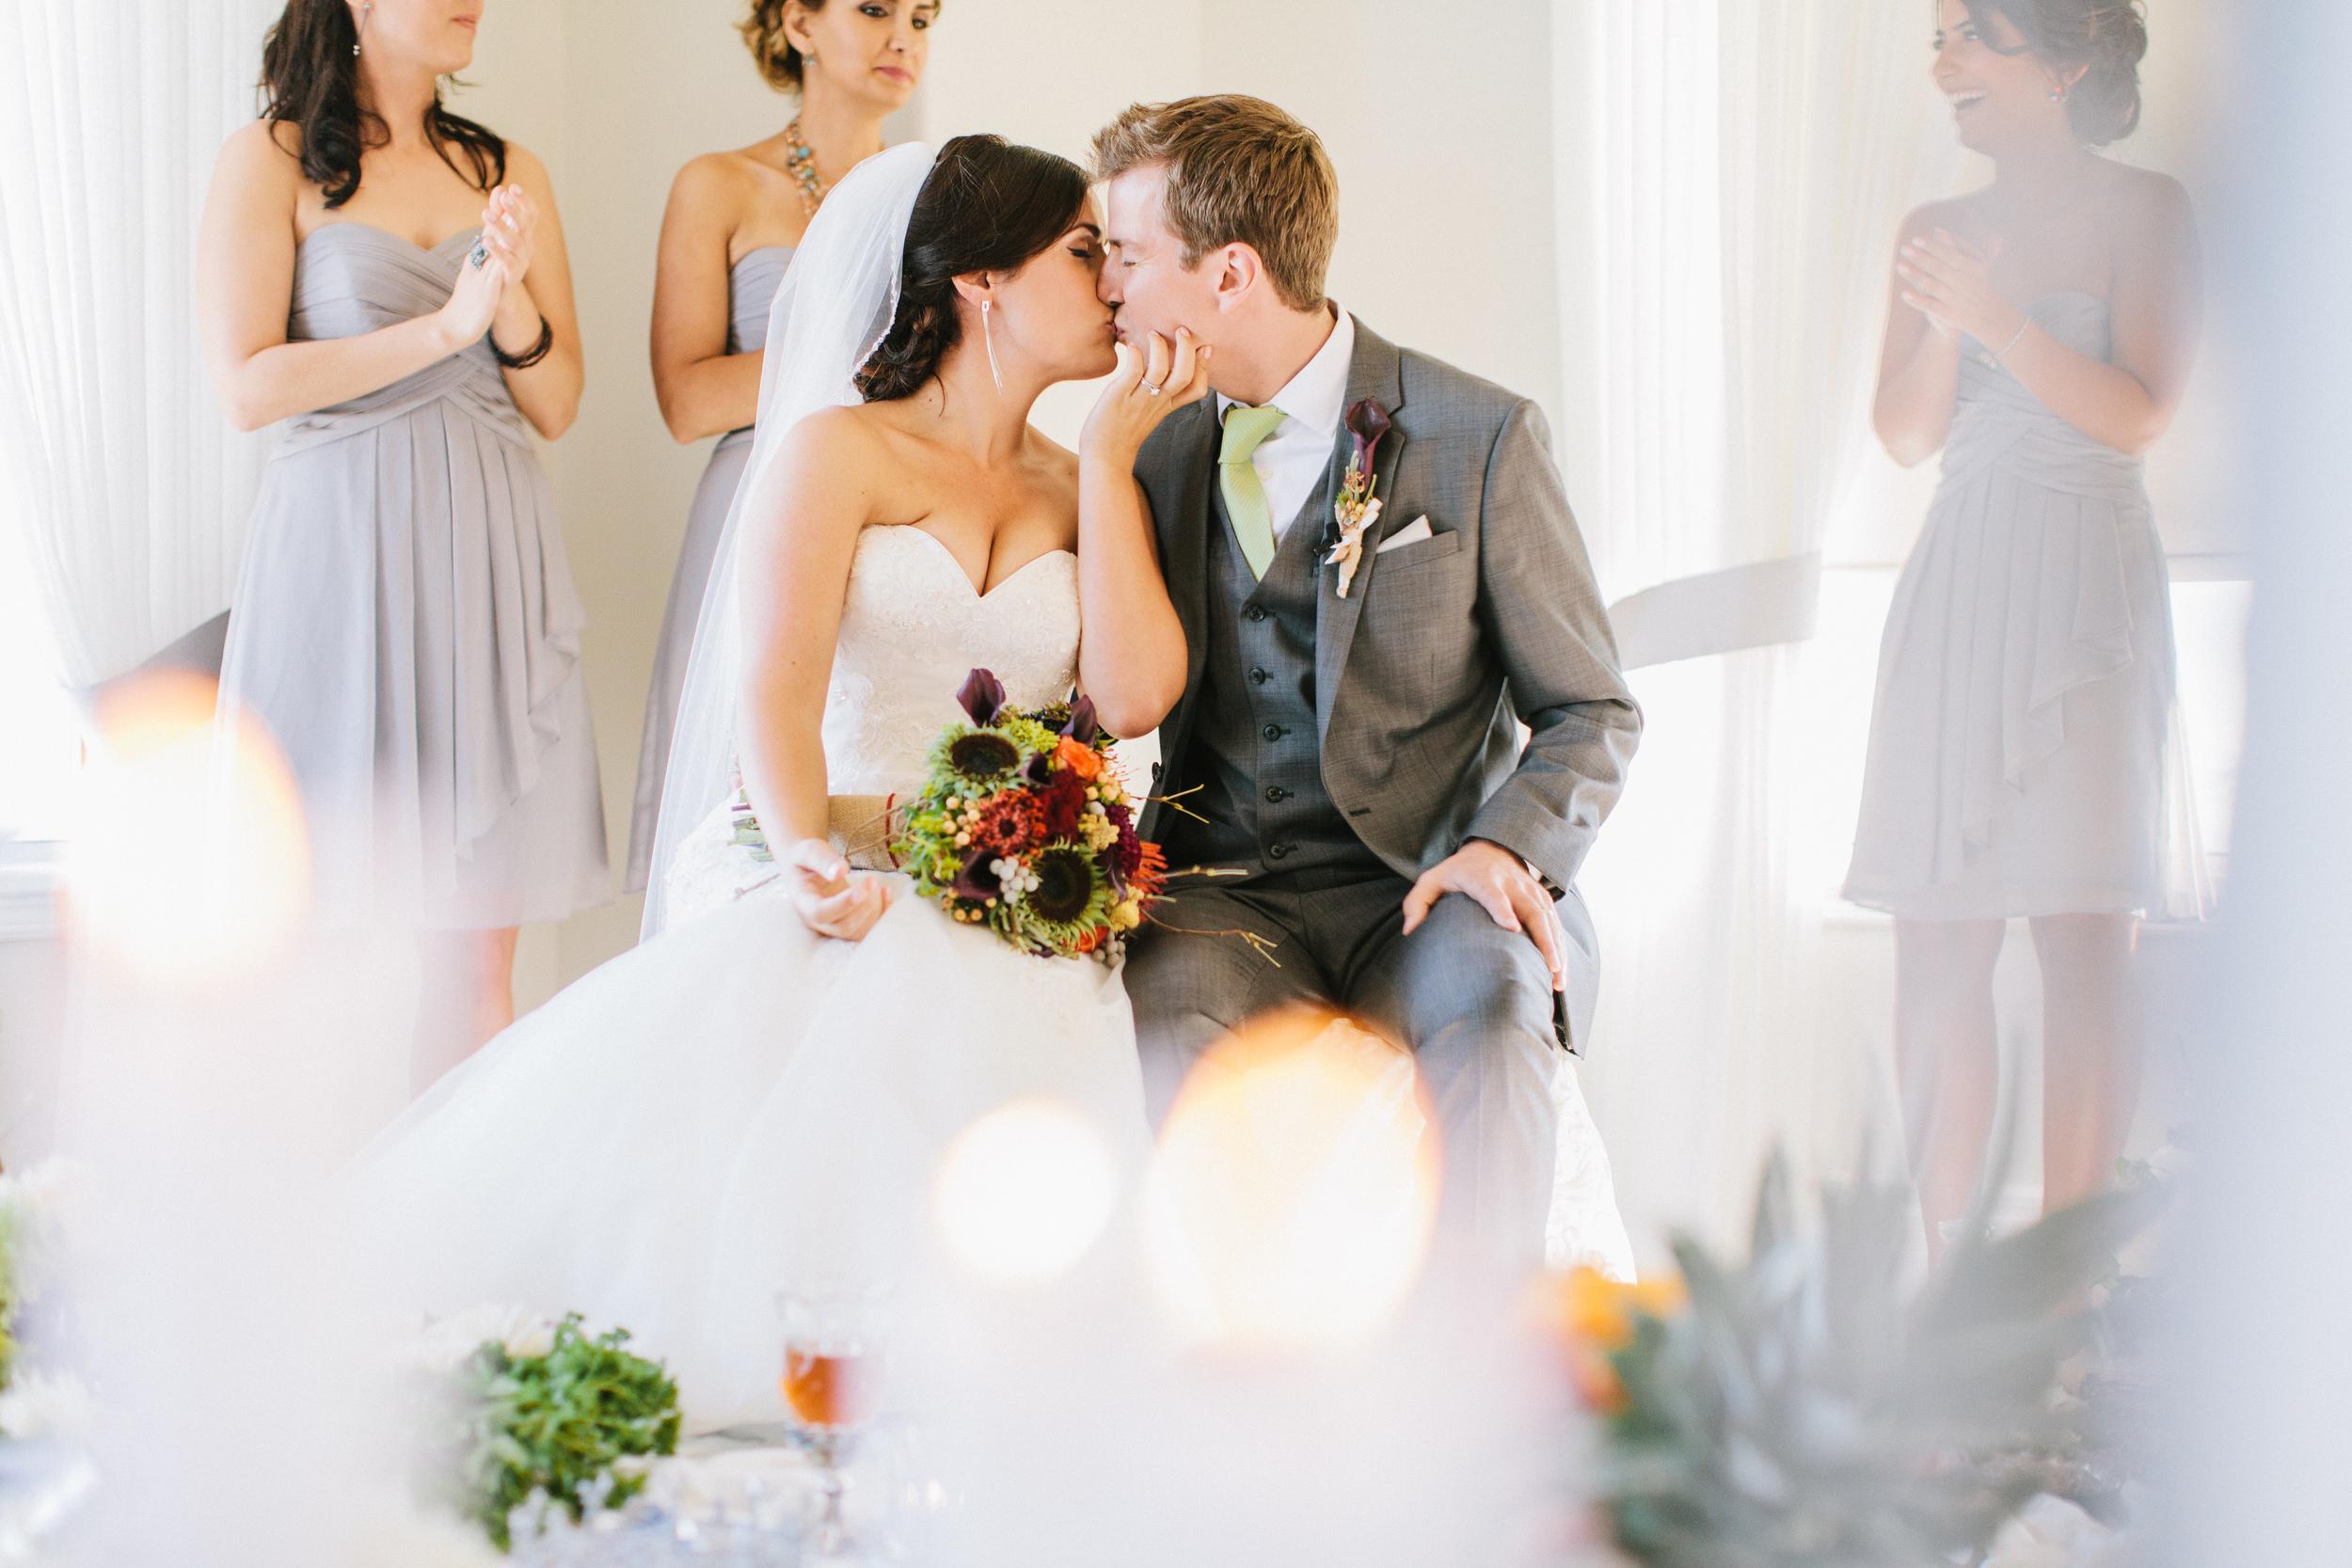 harbour-banquet-hall-oakville-wedding-photographer-michael-rousseau-photography-persian-wedding-photographer-isabella-daniel026.JPG